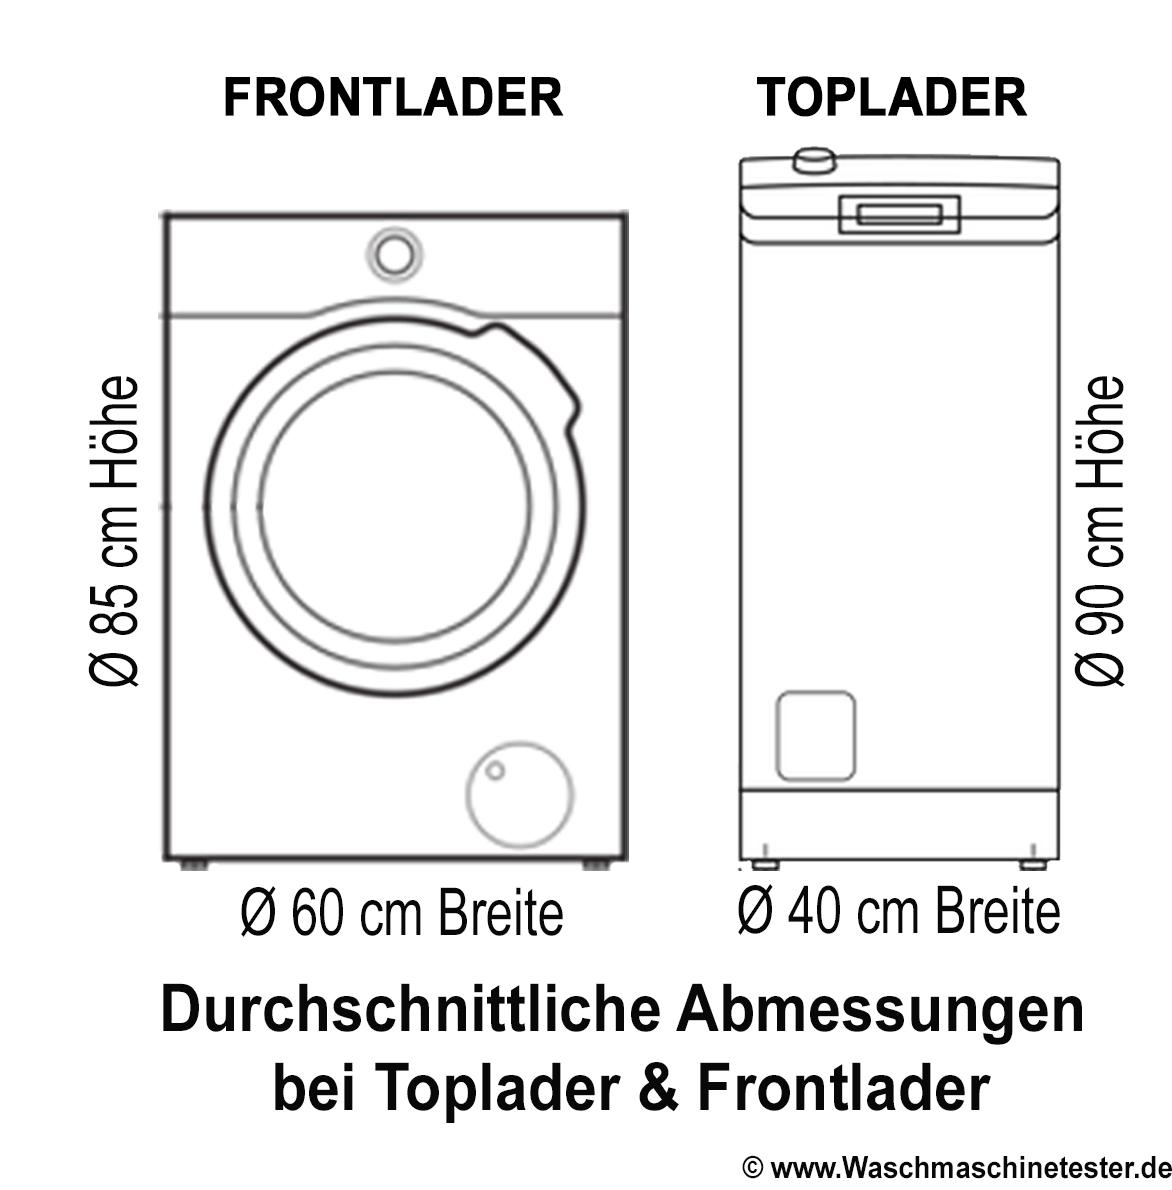 Super groessenvergleich-waschmaschinen-illustration - Waschmaschinetester.de BW55